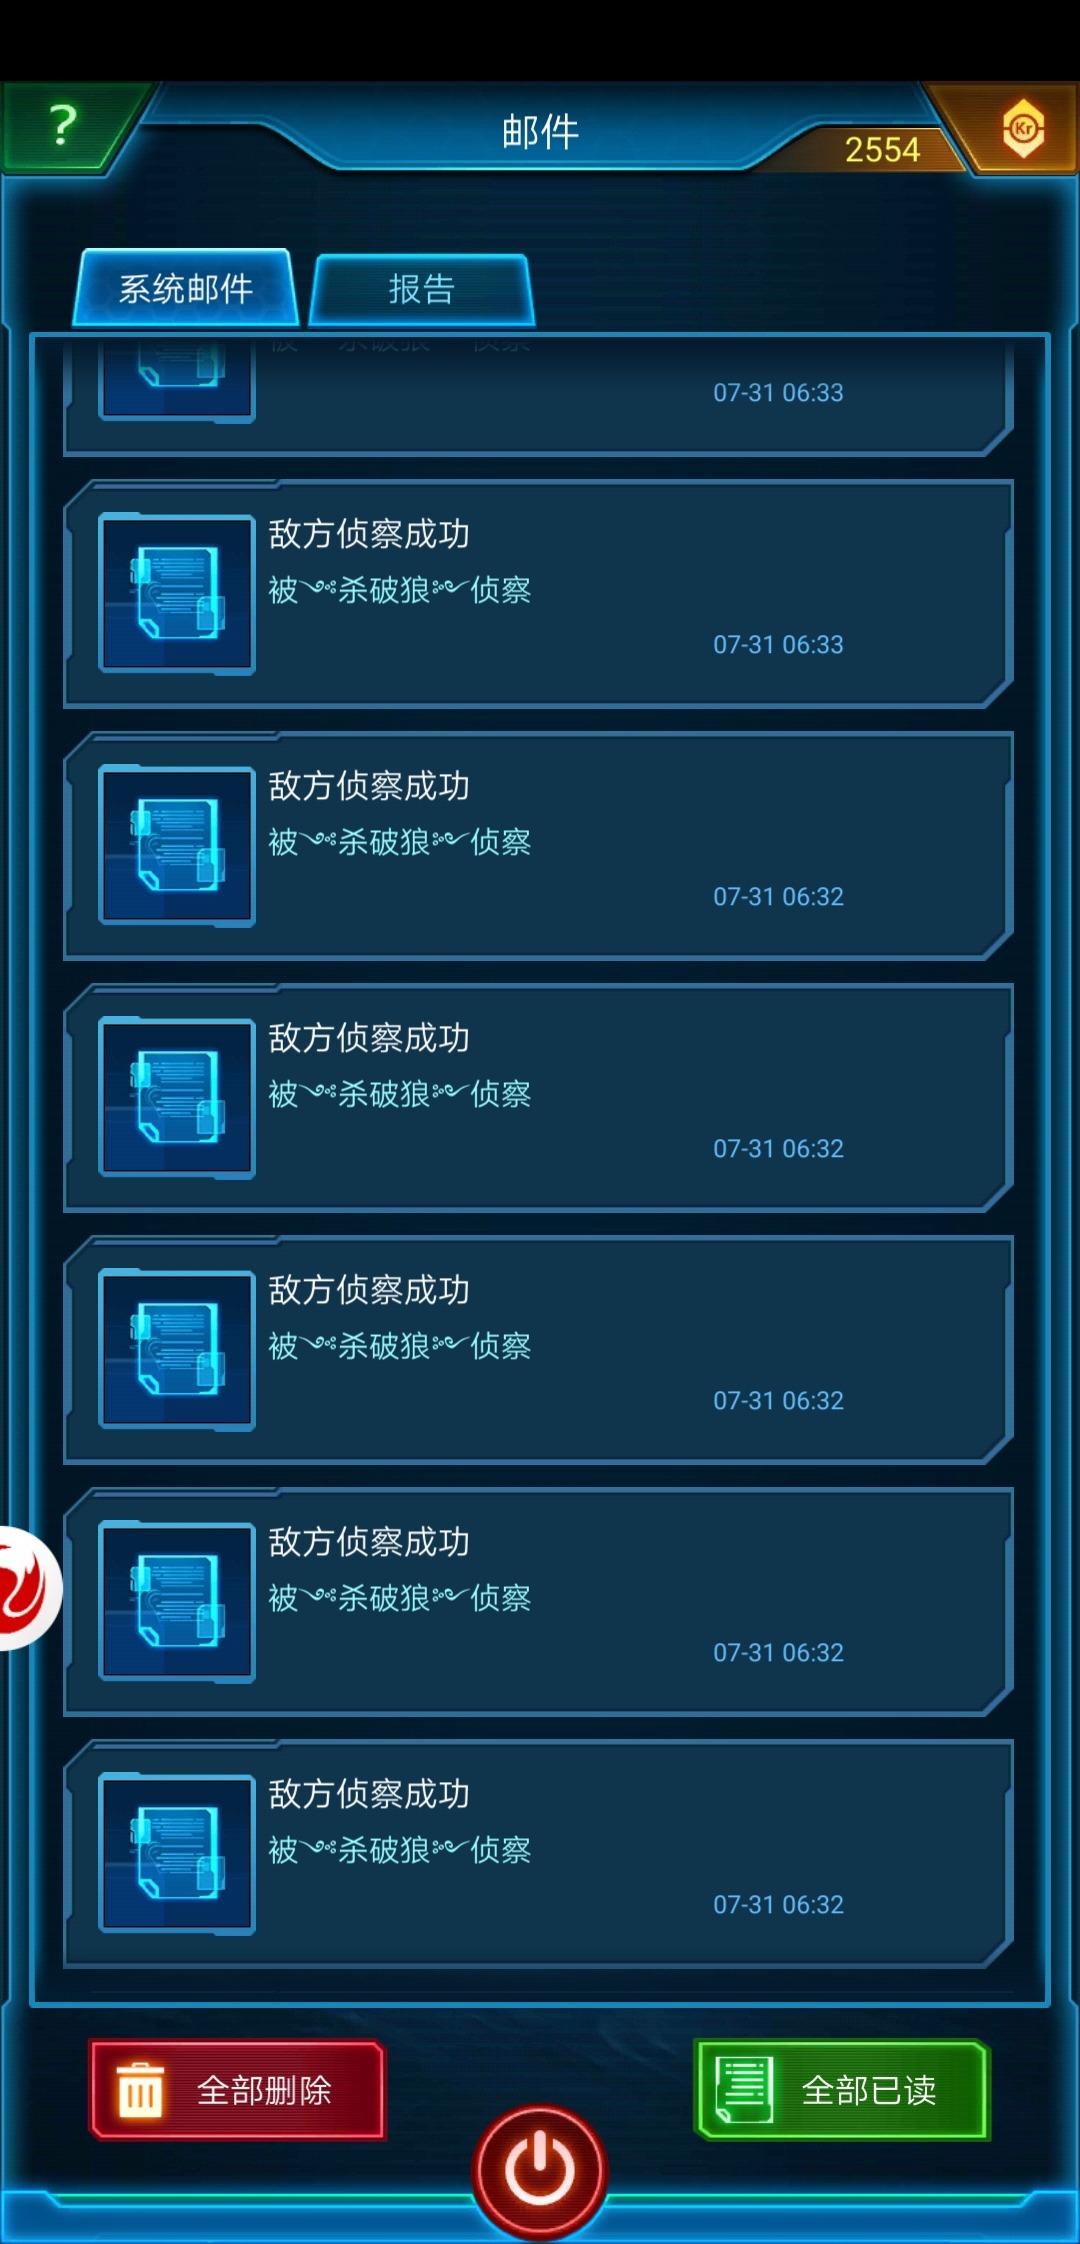 Screenshot_20190731_074740_com.jedigames.p16s.luobo.jpg